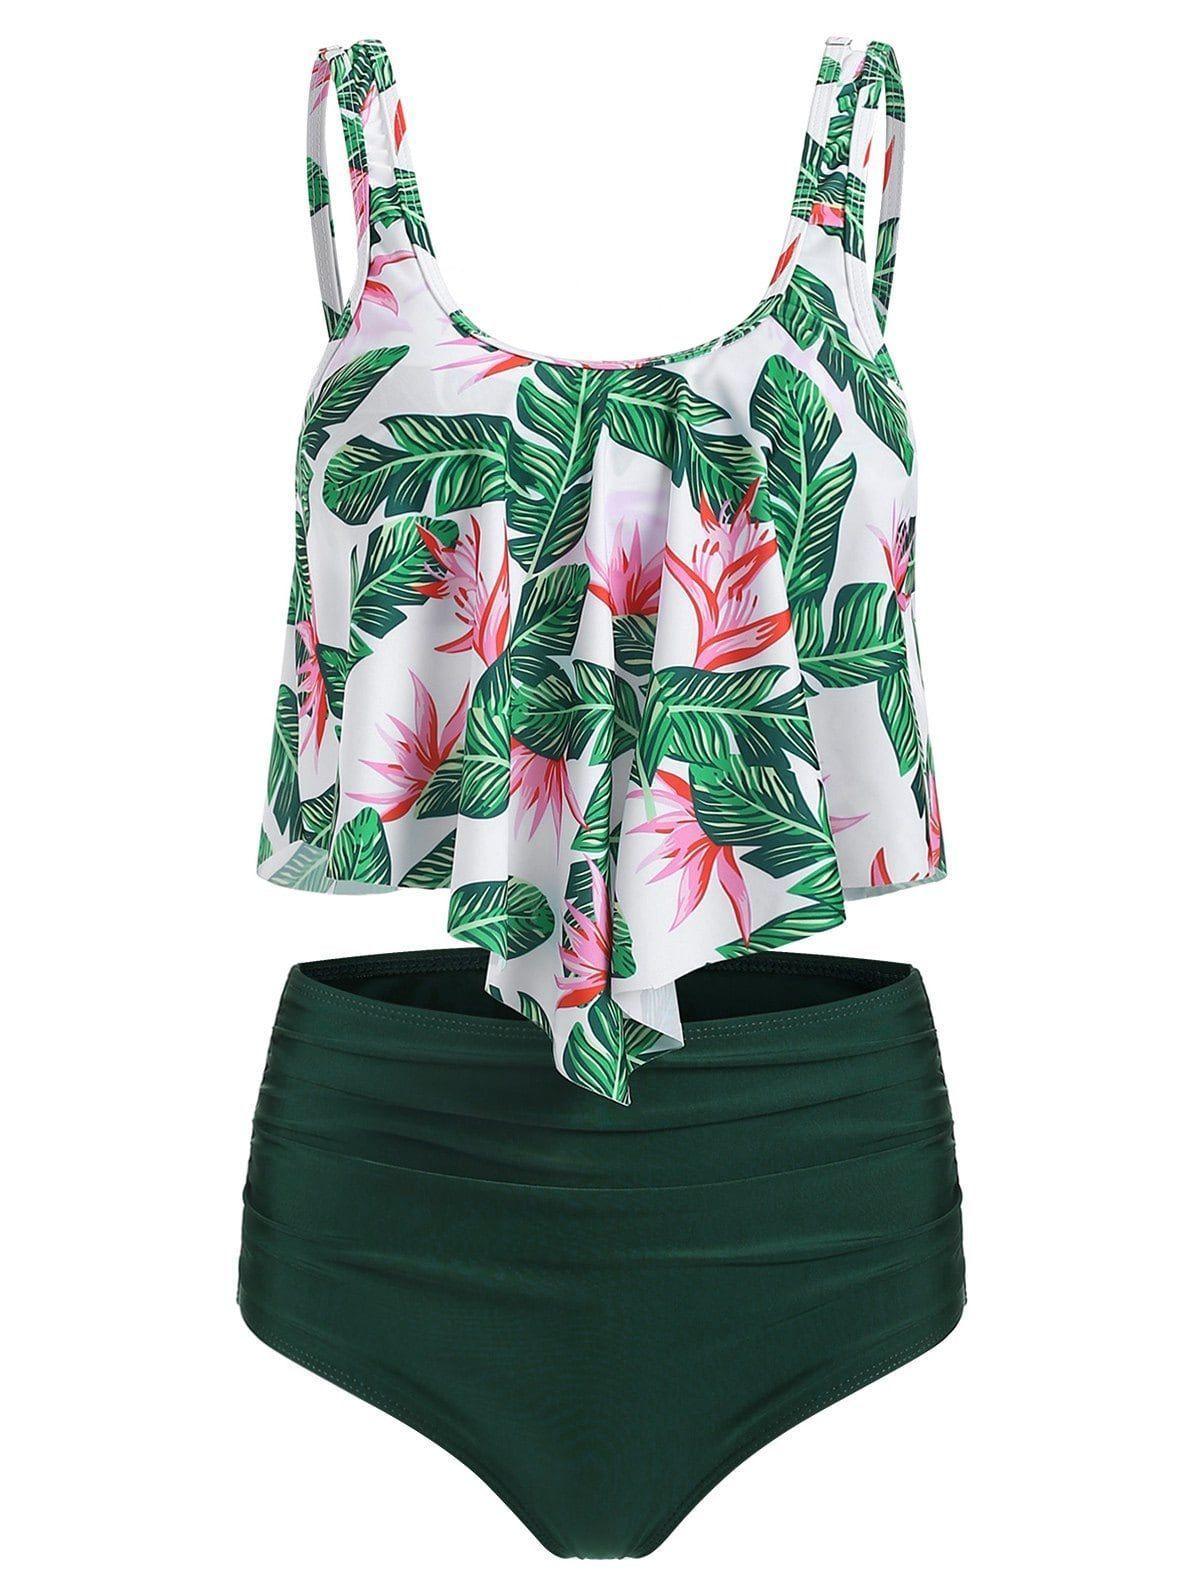 Tankini Swimsuits for Women Cute Printed Overlay Tankini Set Tankini Swimsuits f… – Popular – Swimsuit